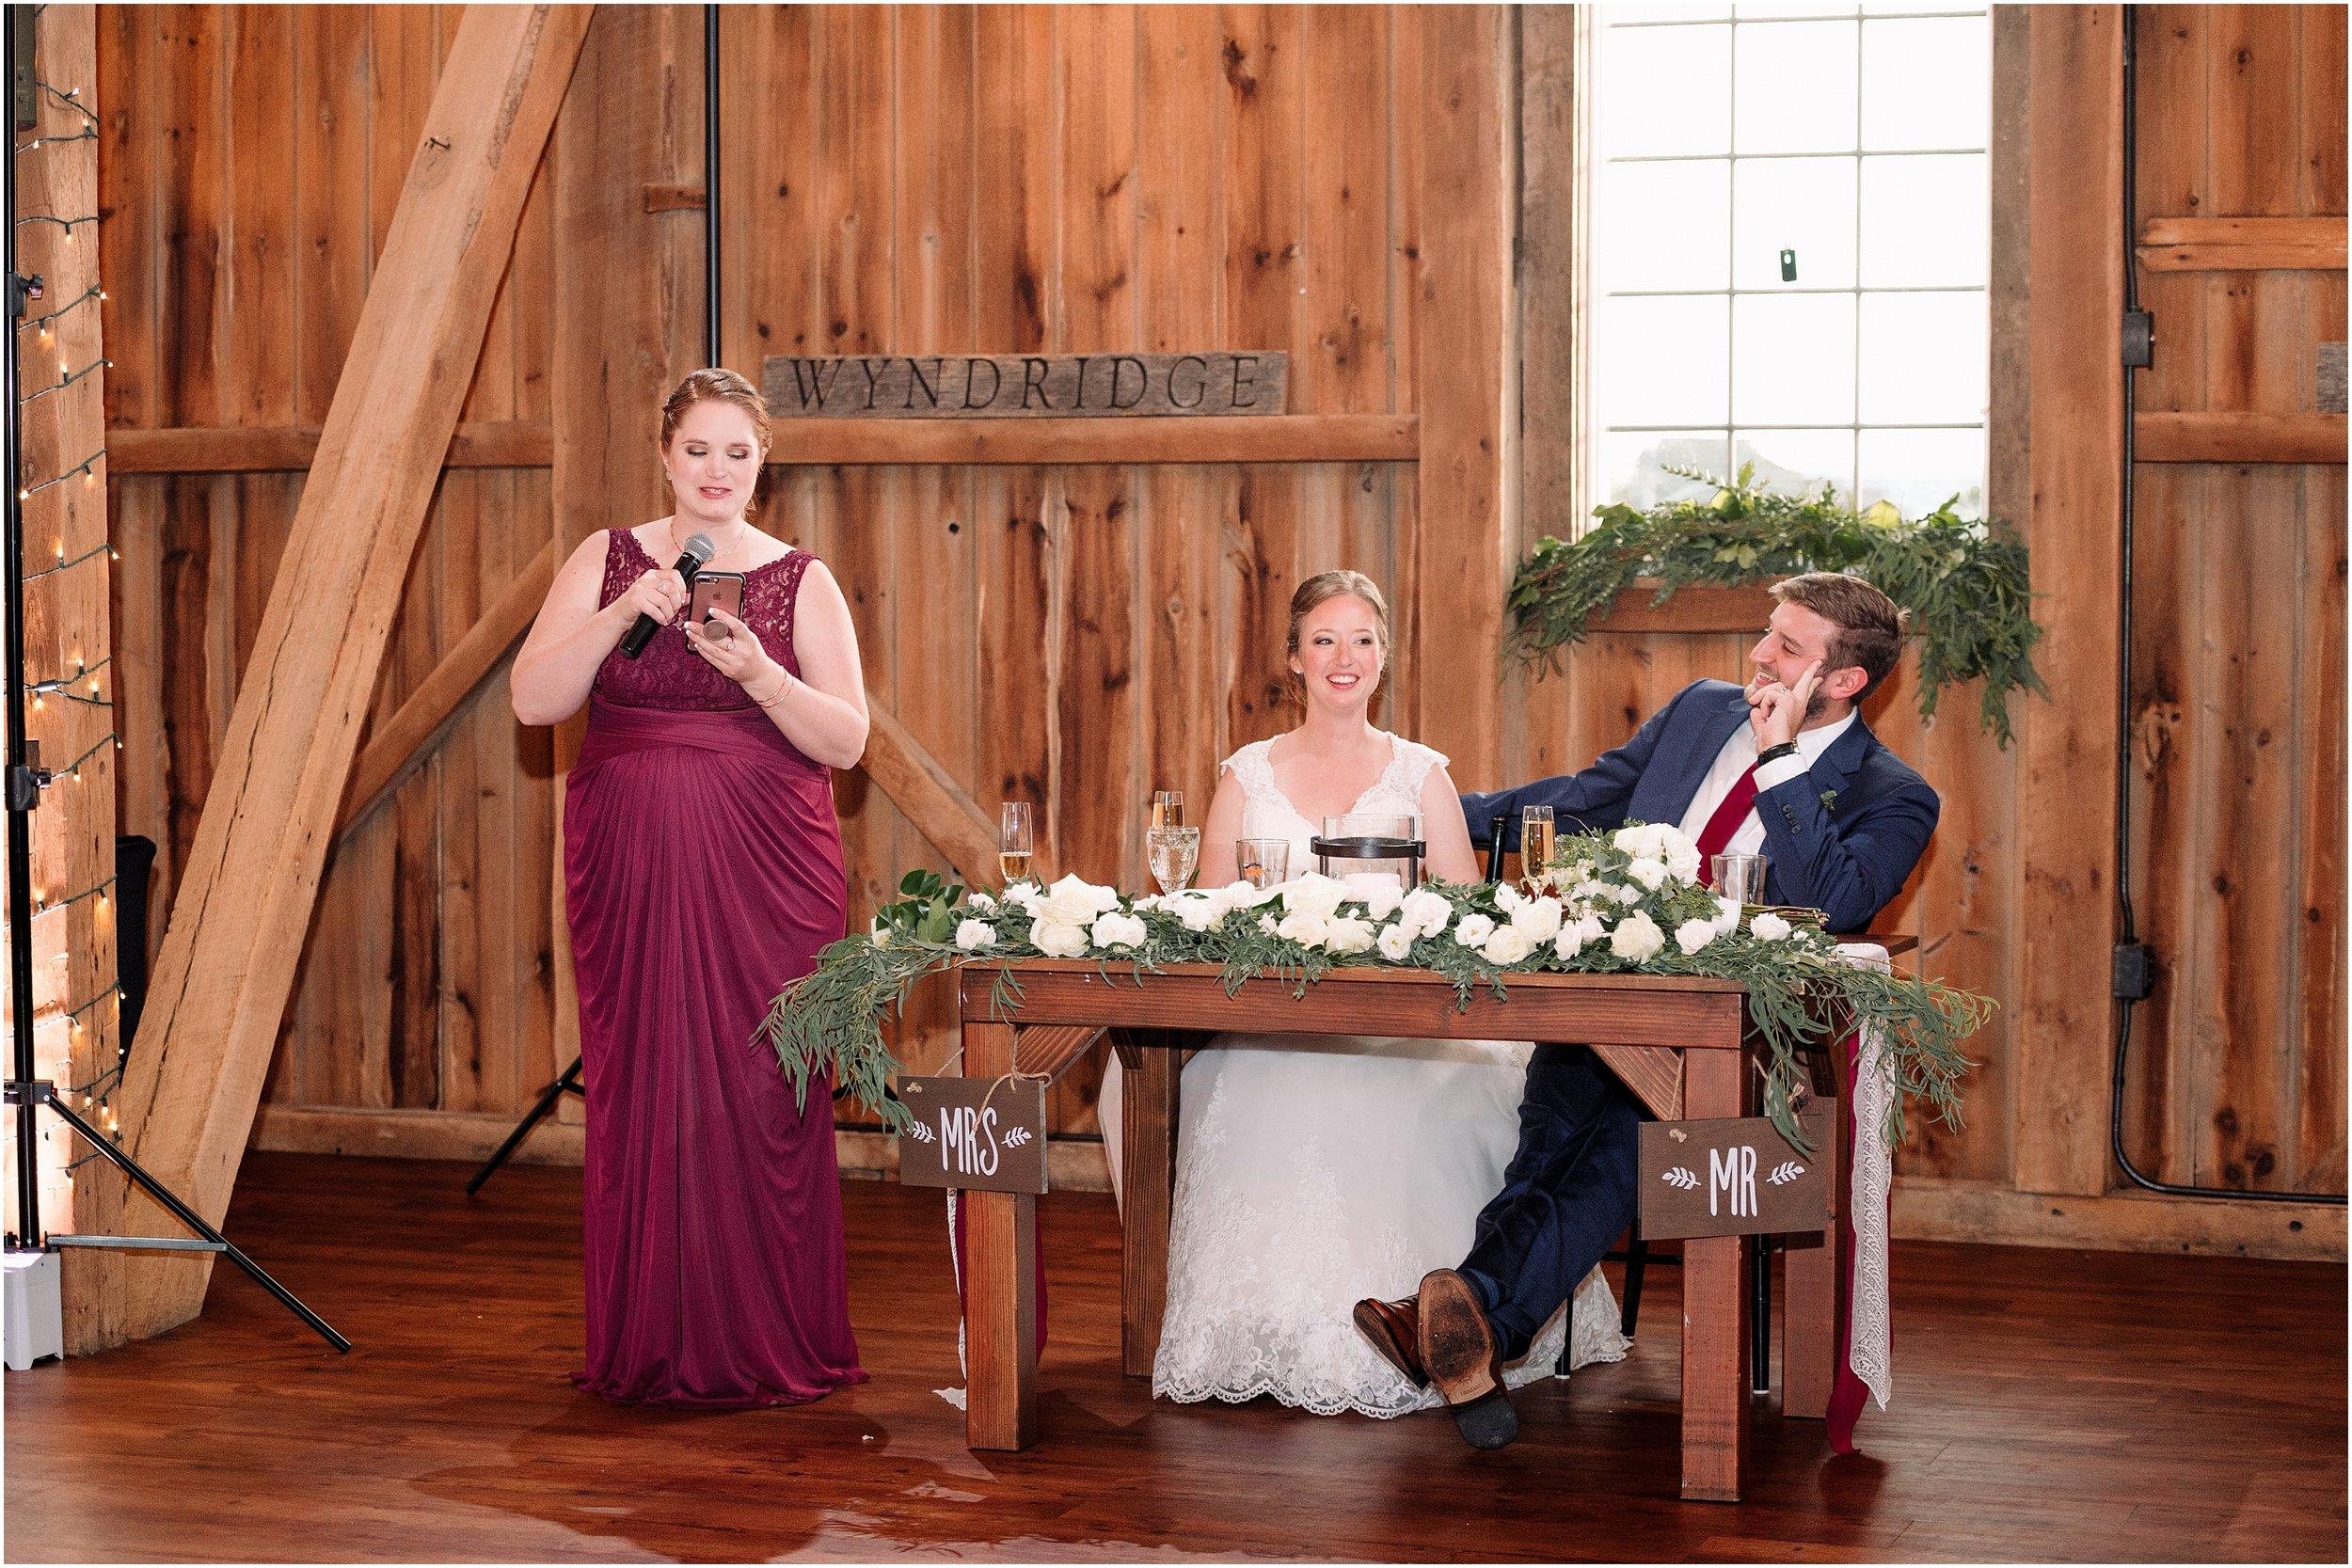 hannah leigh photography Wyndridge Farm Wedding York PA_1550.jpg